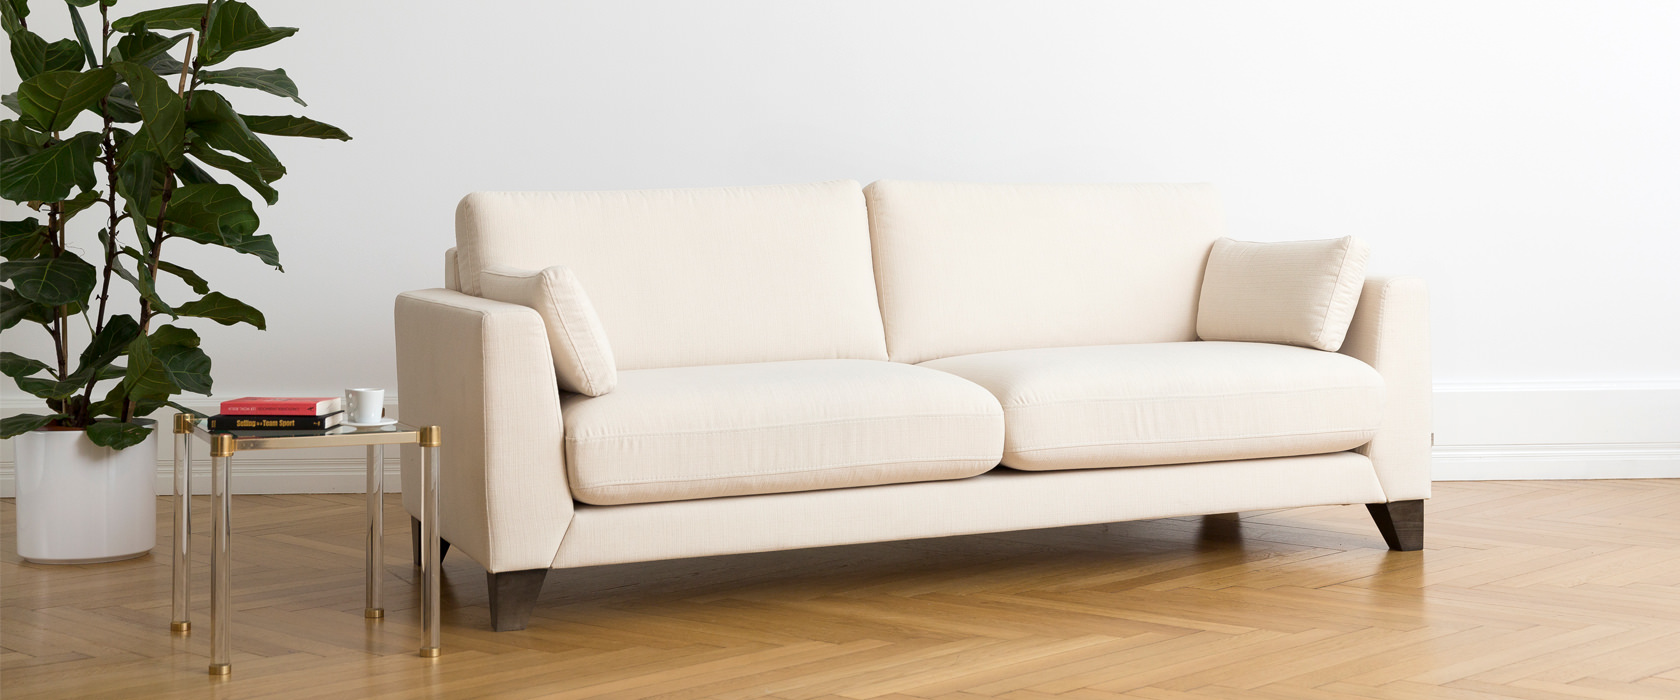 Трехместный диван Paolo - Фото 1 - Pufetto